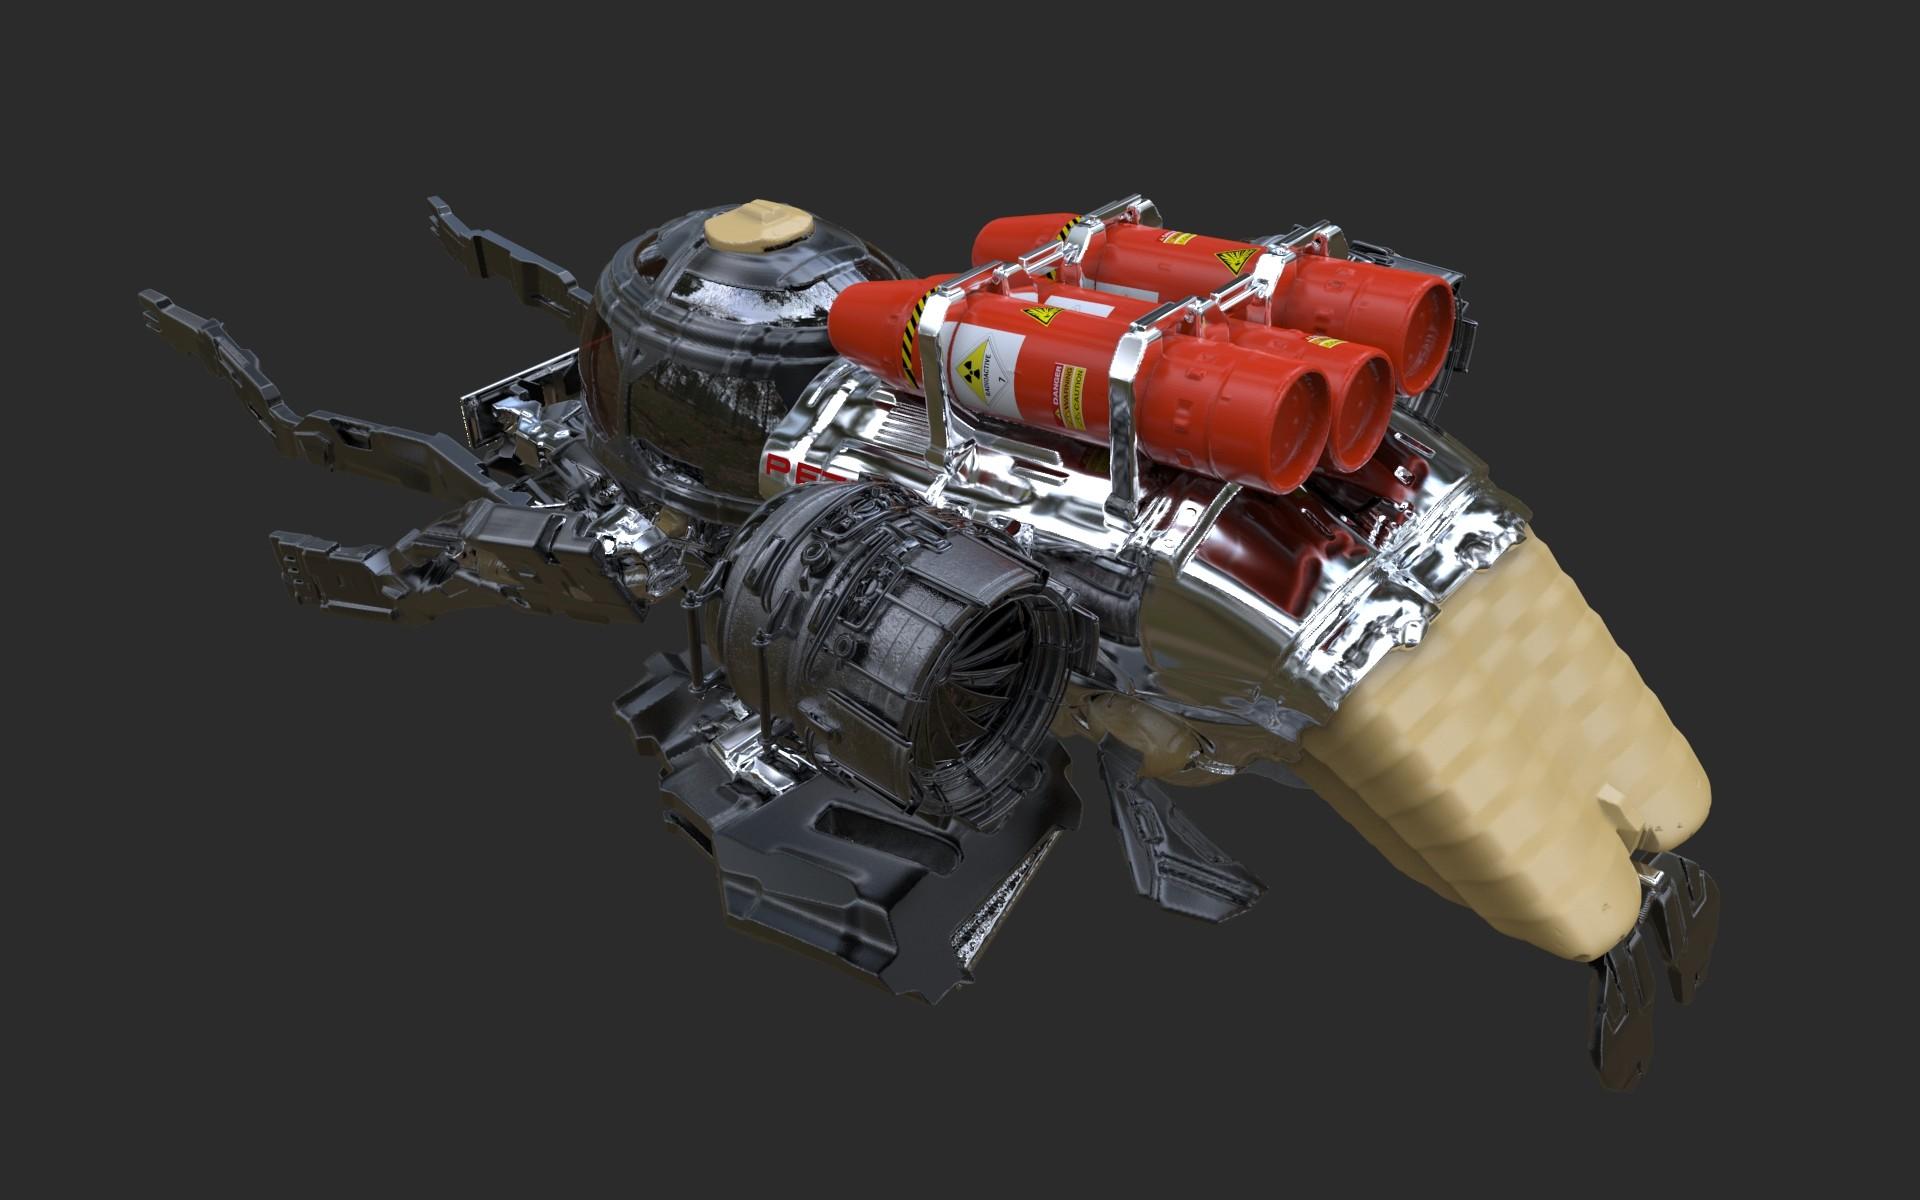 Sergio seabra shrimpfly spaceship2 48